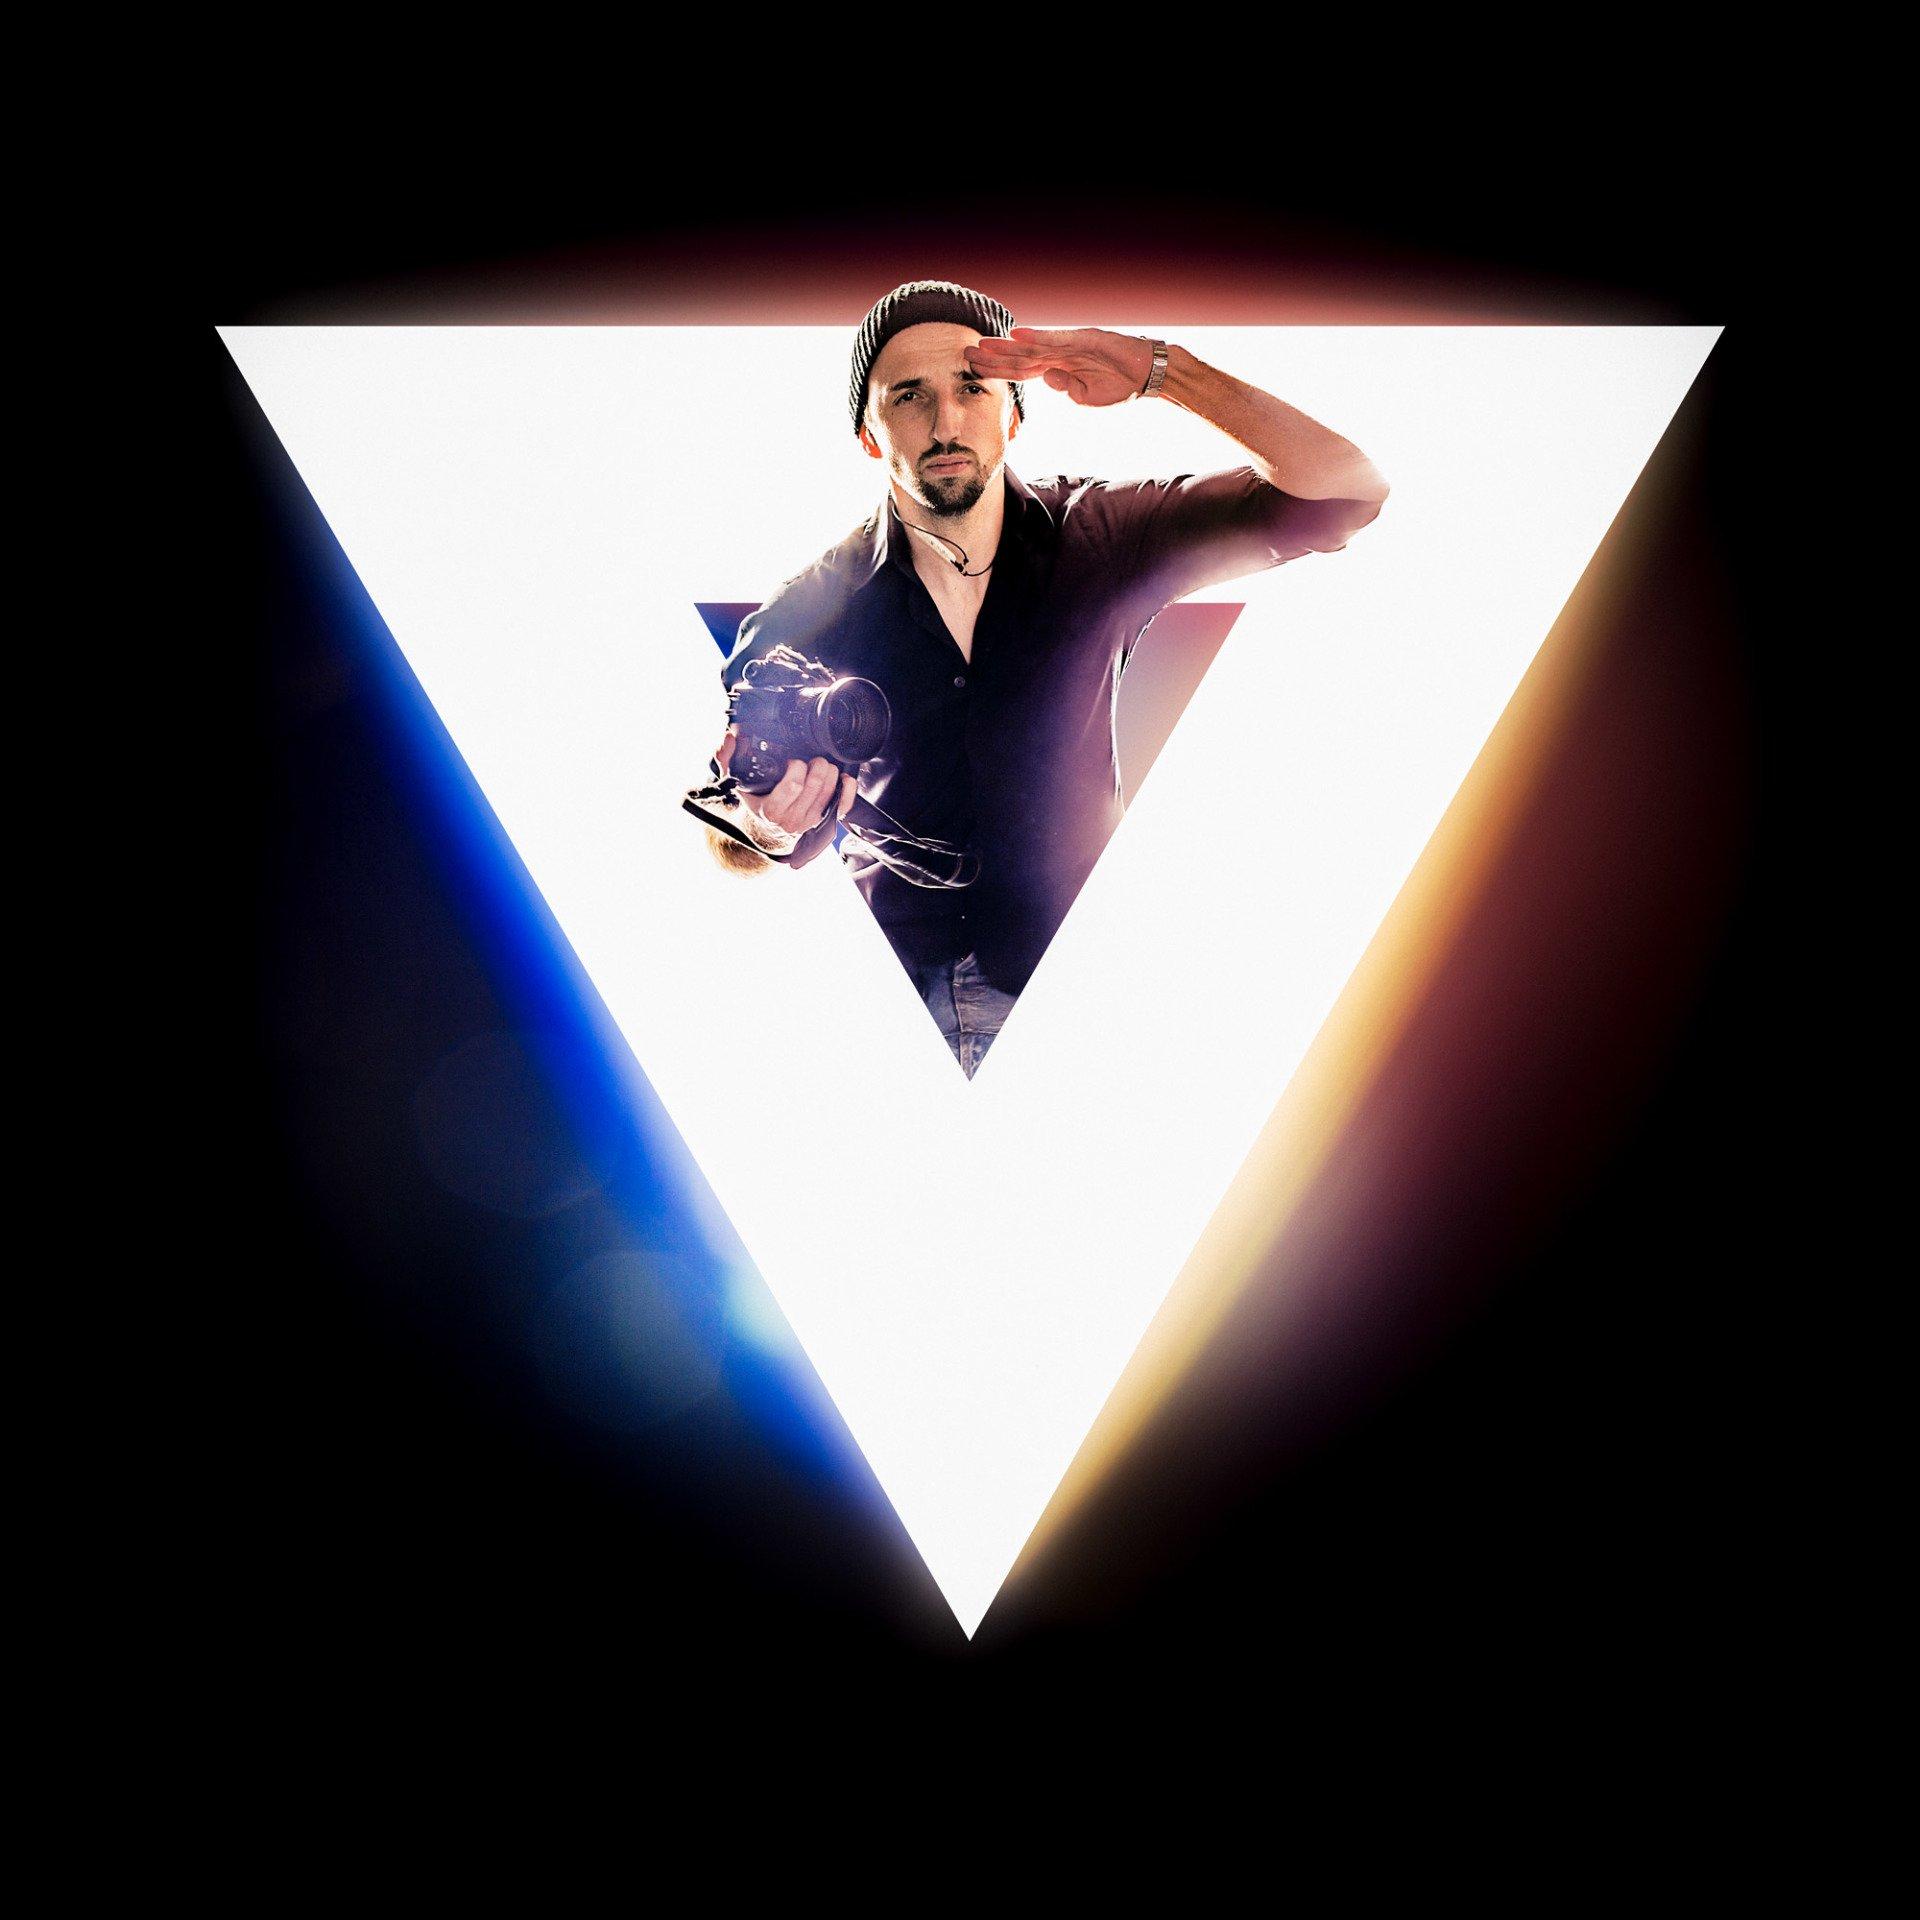 Viktor Stark springt aus seinem dreiecks logo heraus